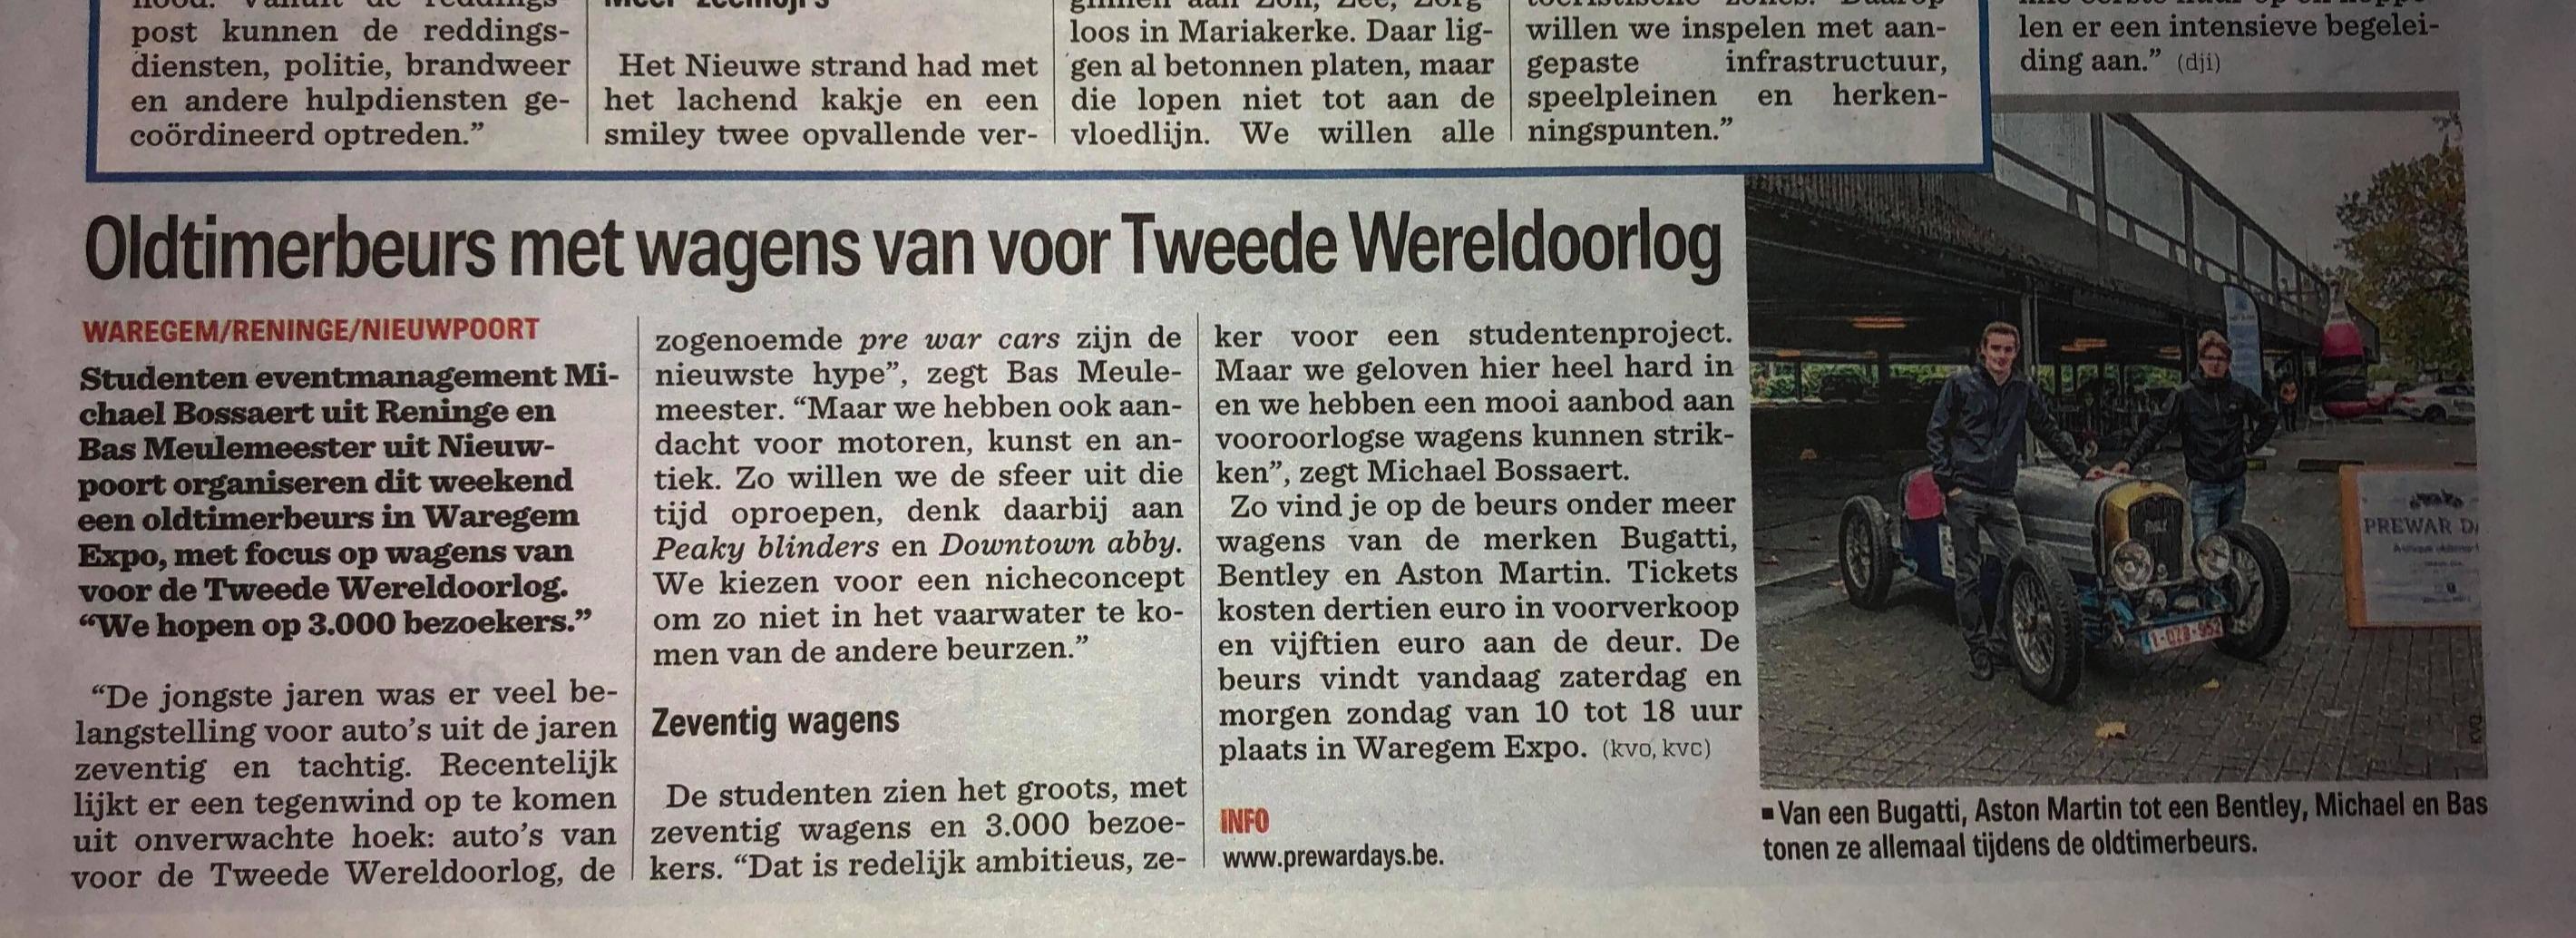 Nieuwsblad_edited